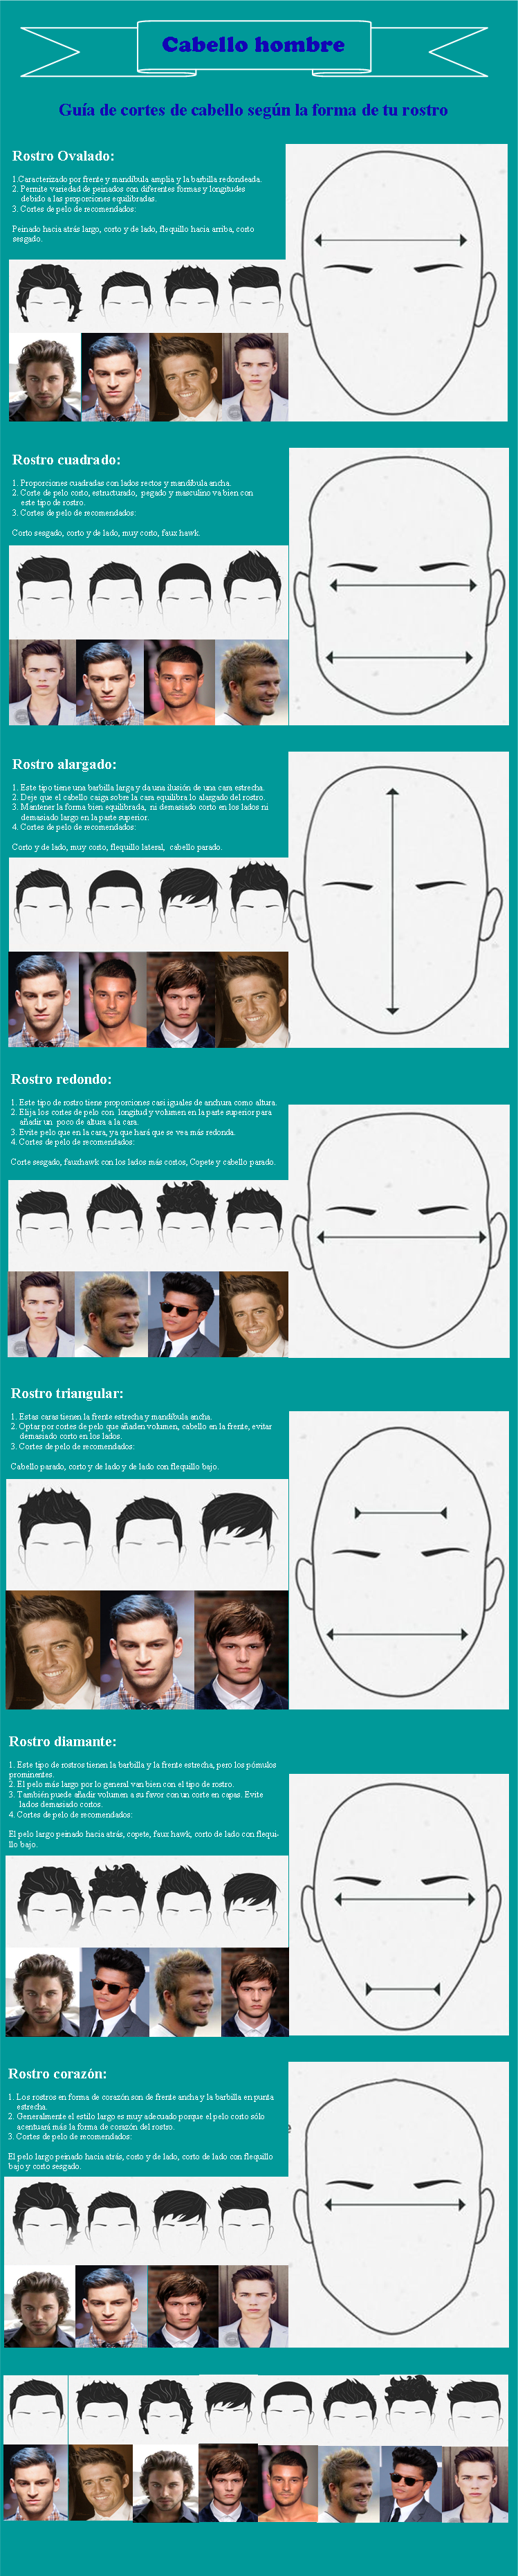 Different types of haircuts for men cortes de cabelo de acordo com formato do rosto  homem de luxo